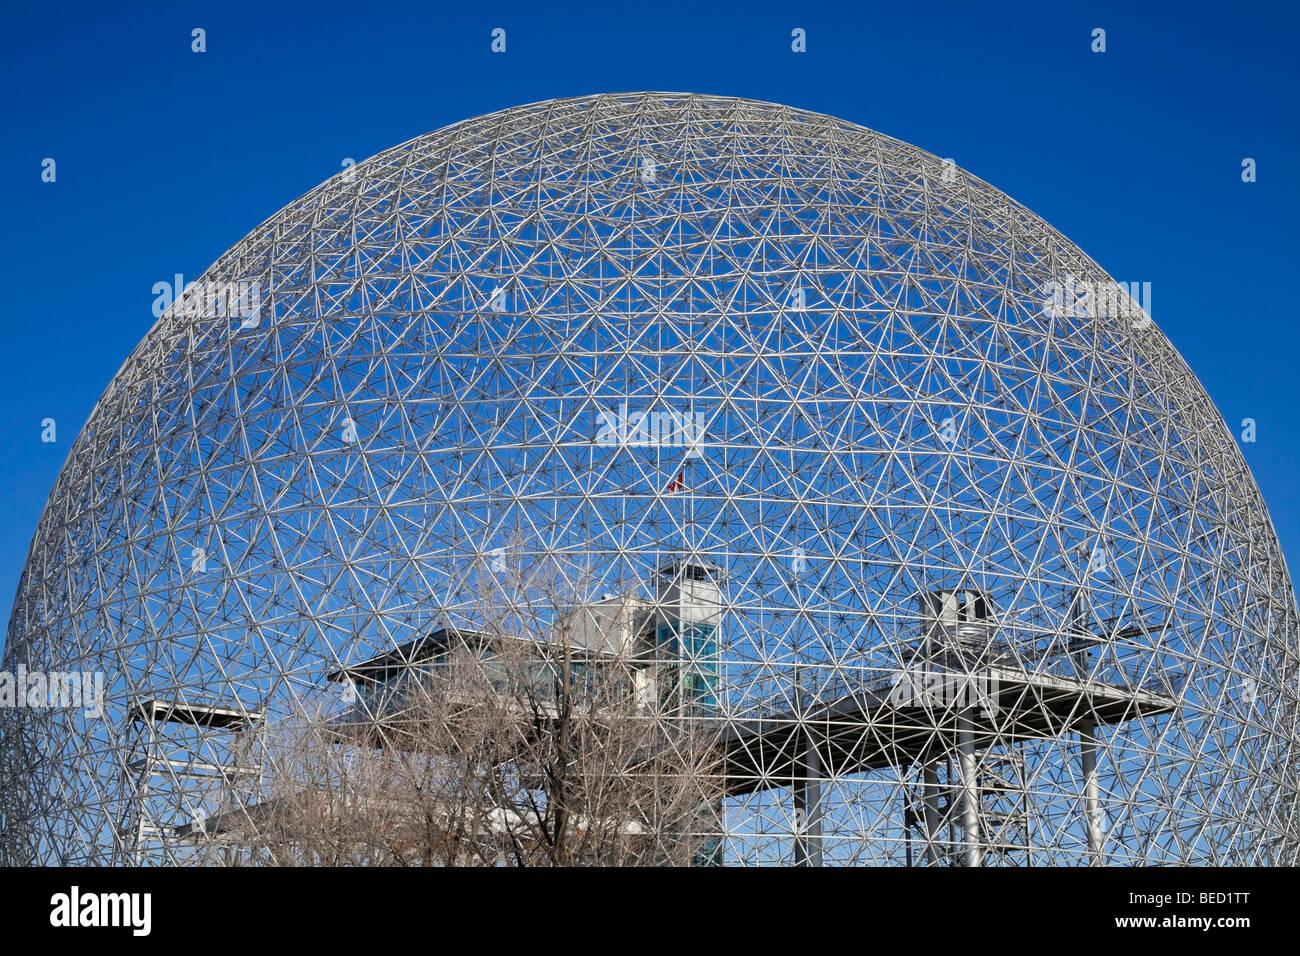 Biosphere Montreal, Quebec, Canada - Stock Image